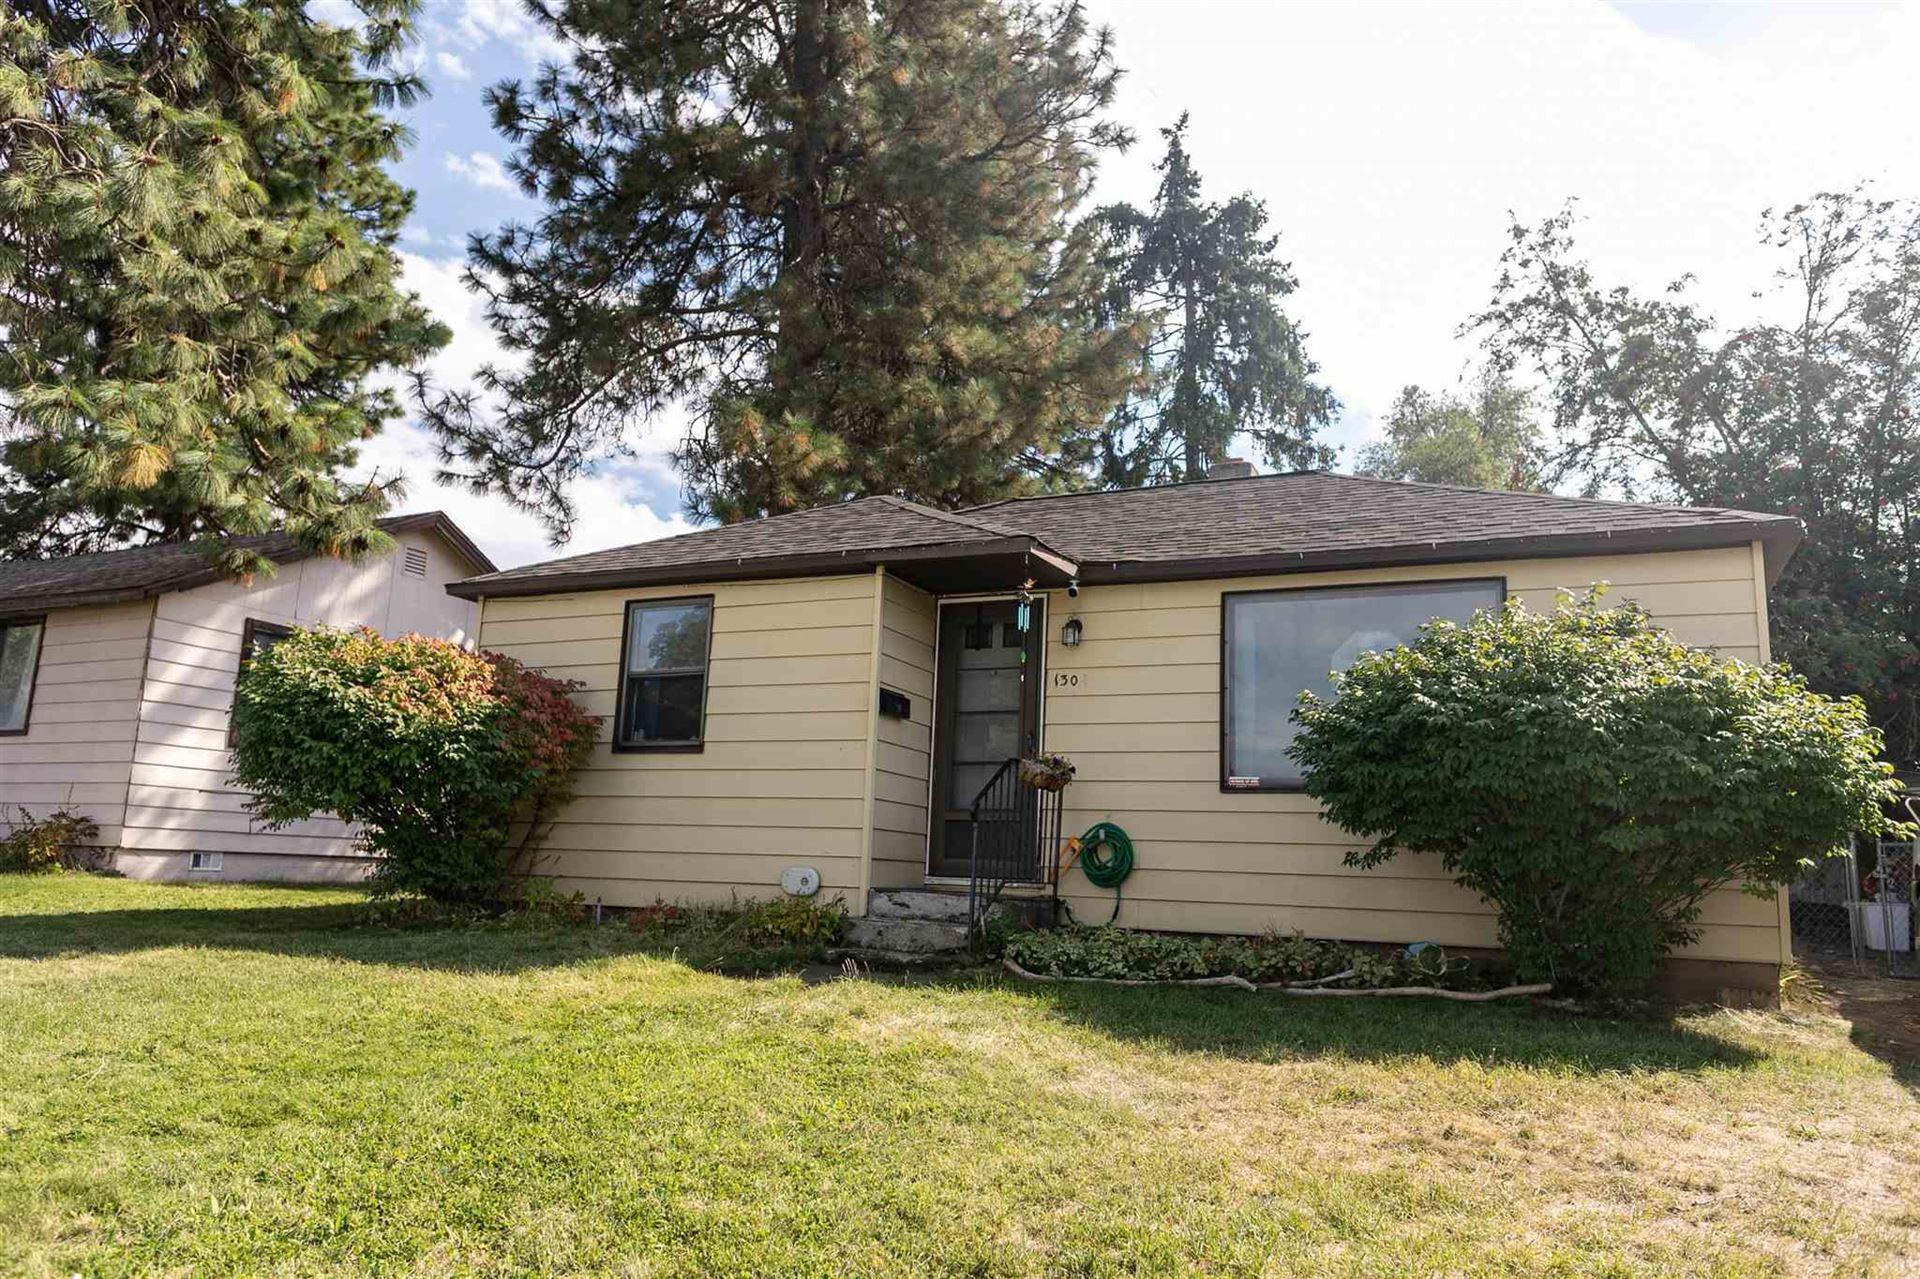 1304 E Columbia Ave, Spokane, WA 99208-3539 - #: 202122470